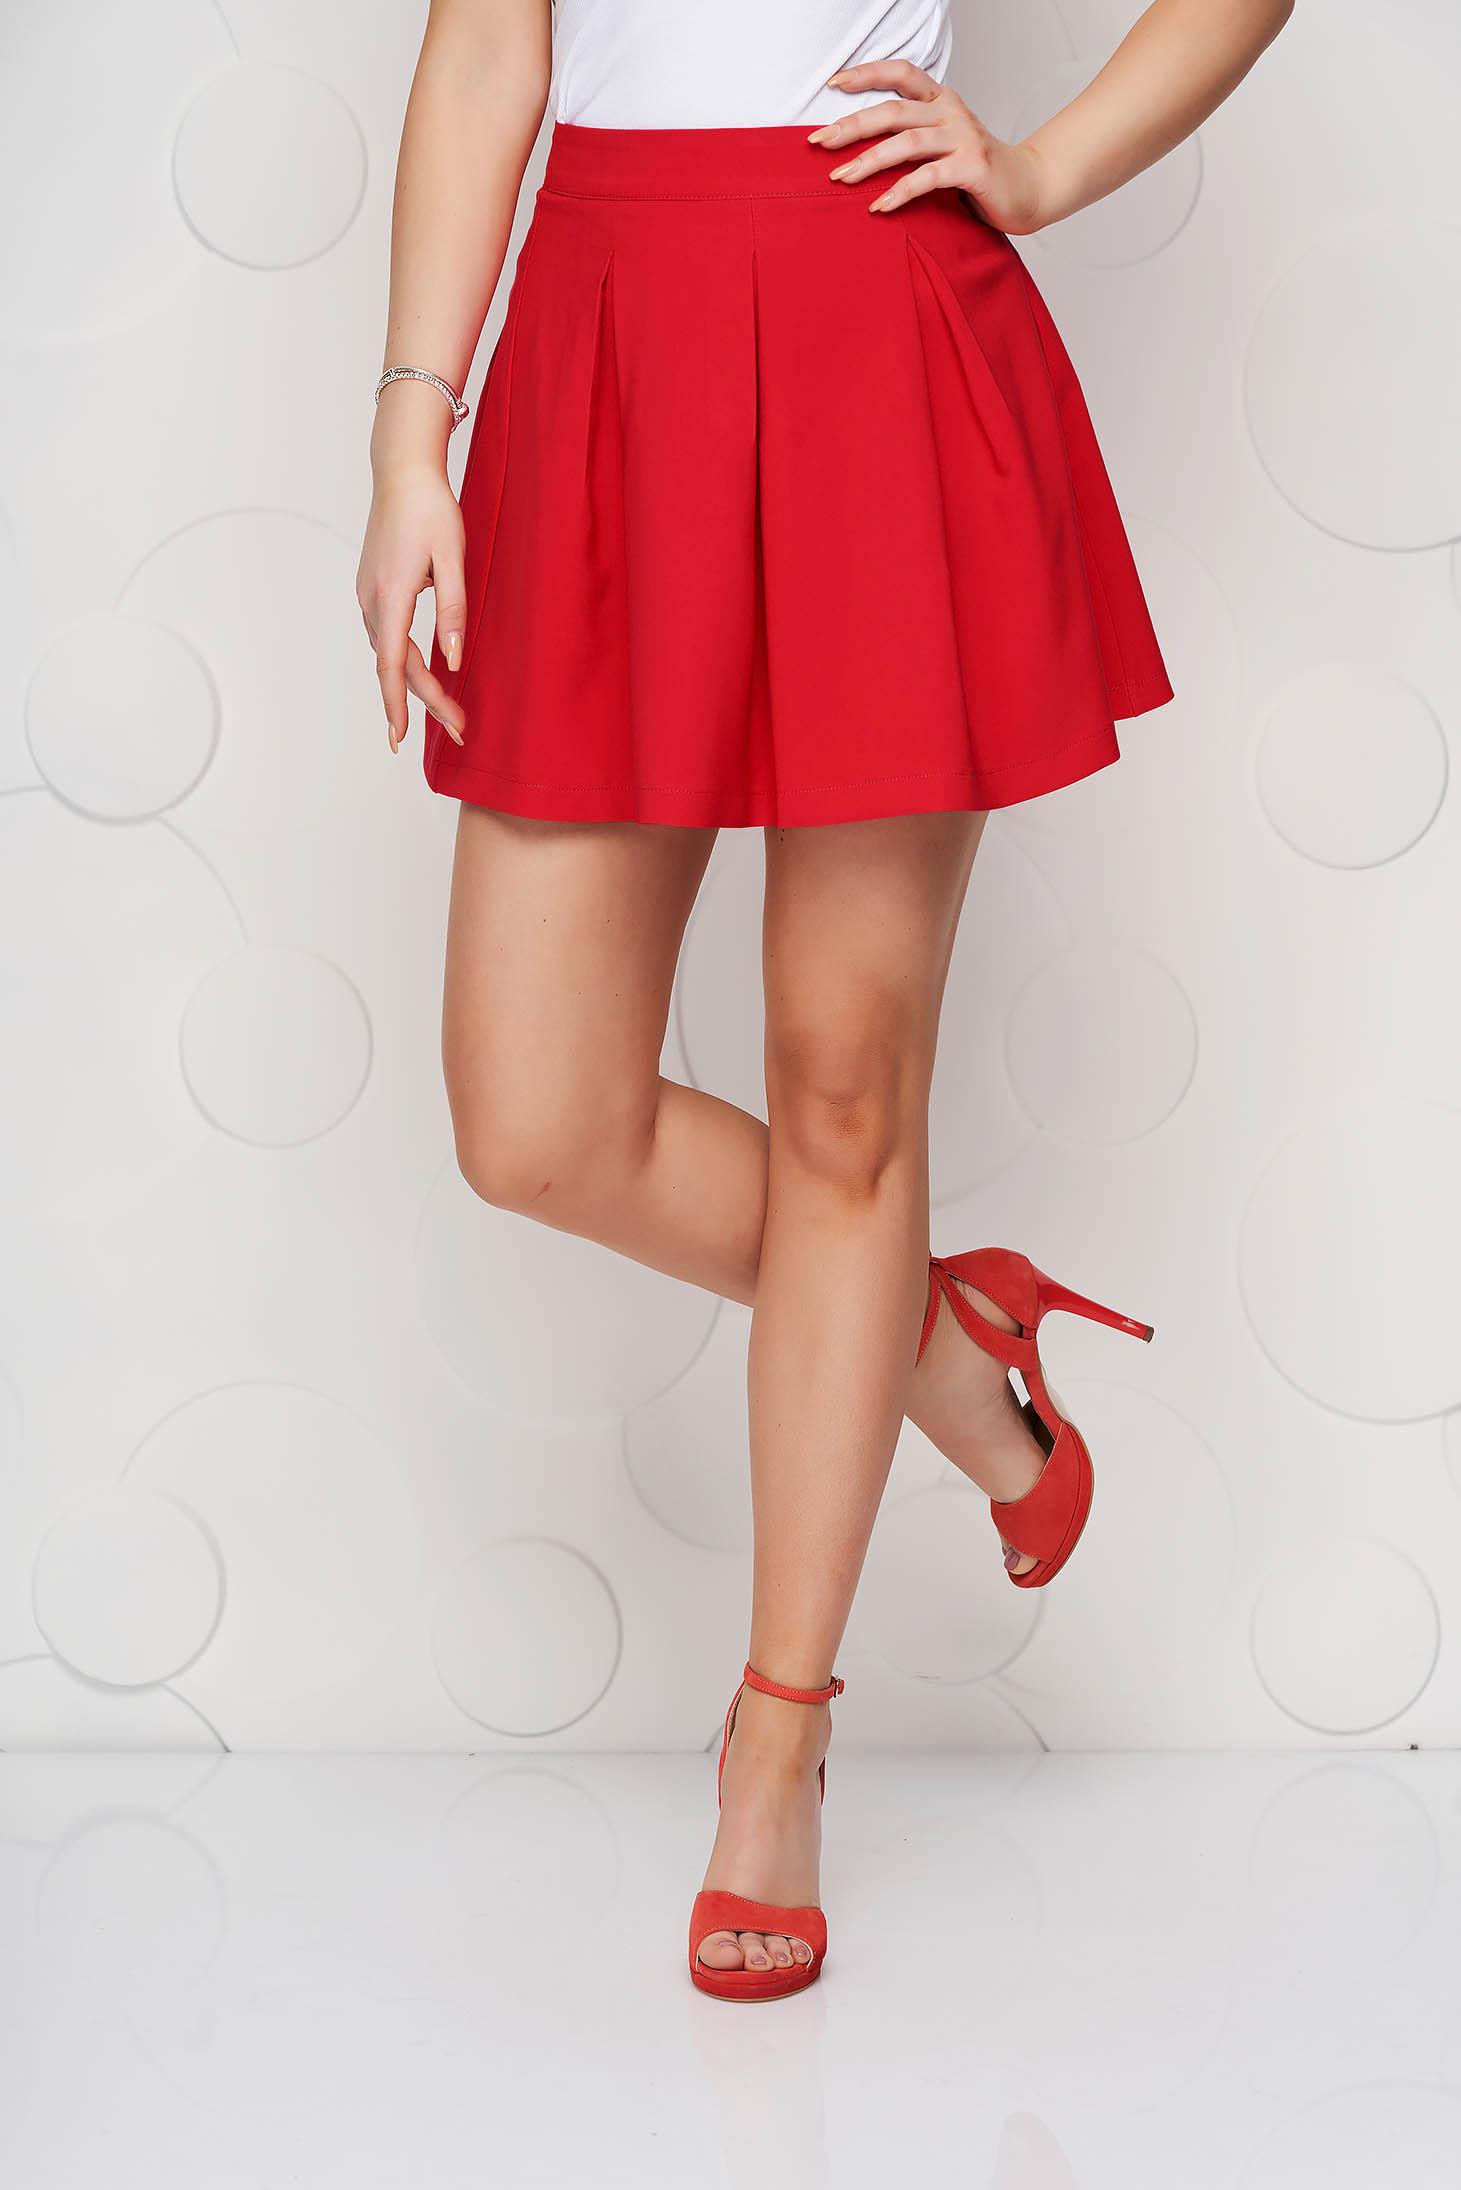 Piros casual harang szoknya enyhén rugalmas anyagból